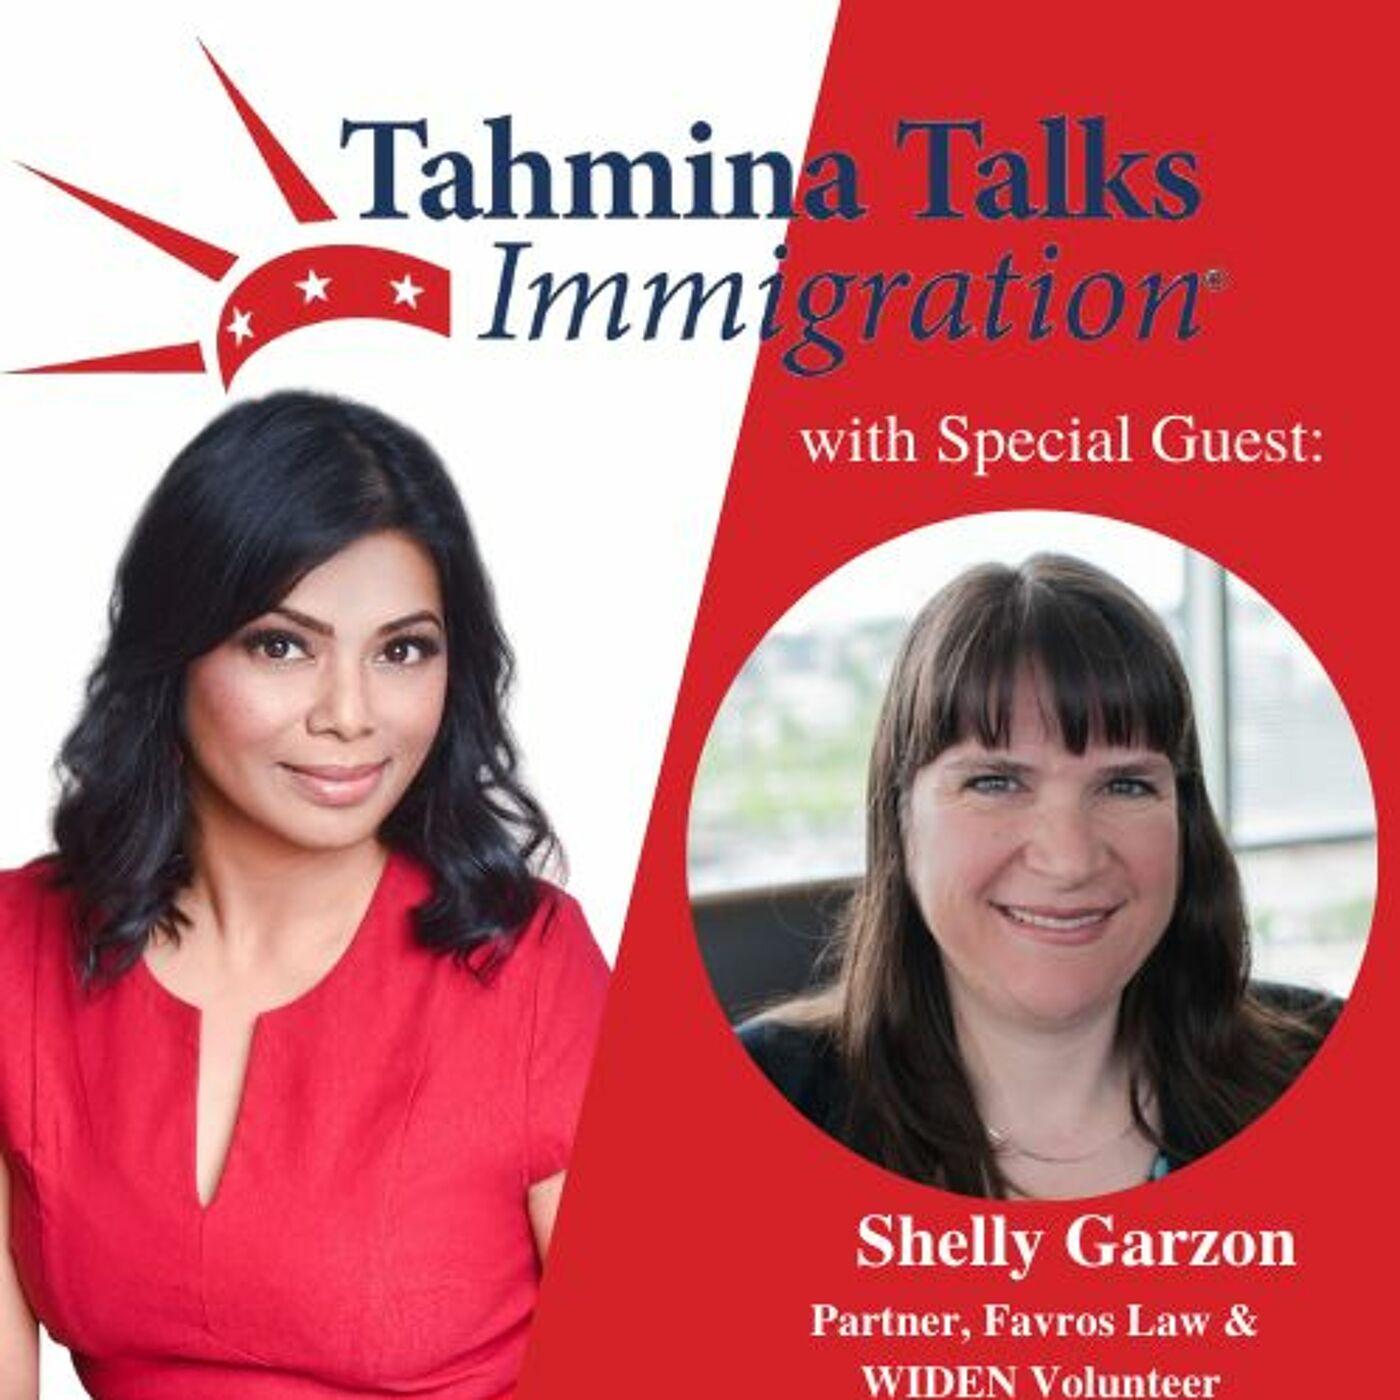 #108 Legal Heroes Series- Shelly Garzon, Partner, Favros Law & WIDEN Volunteer